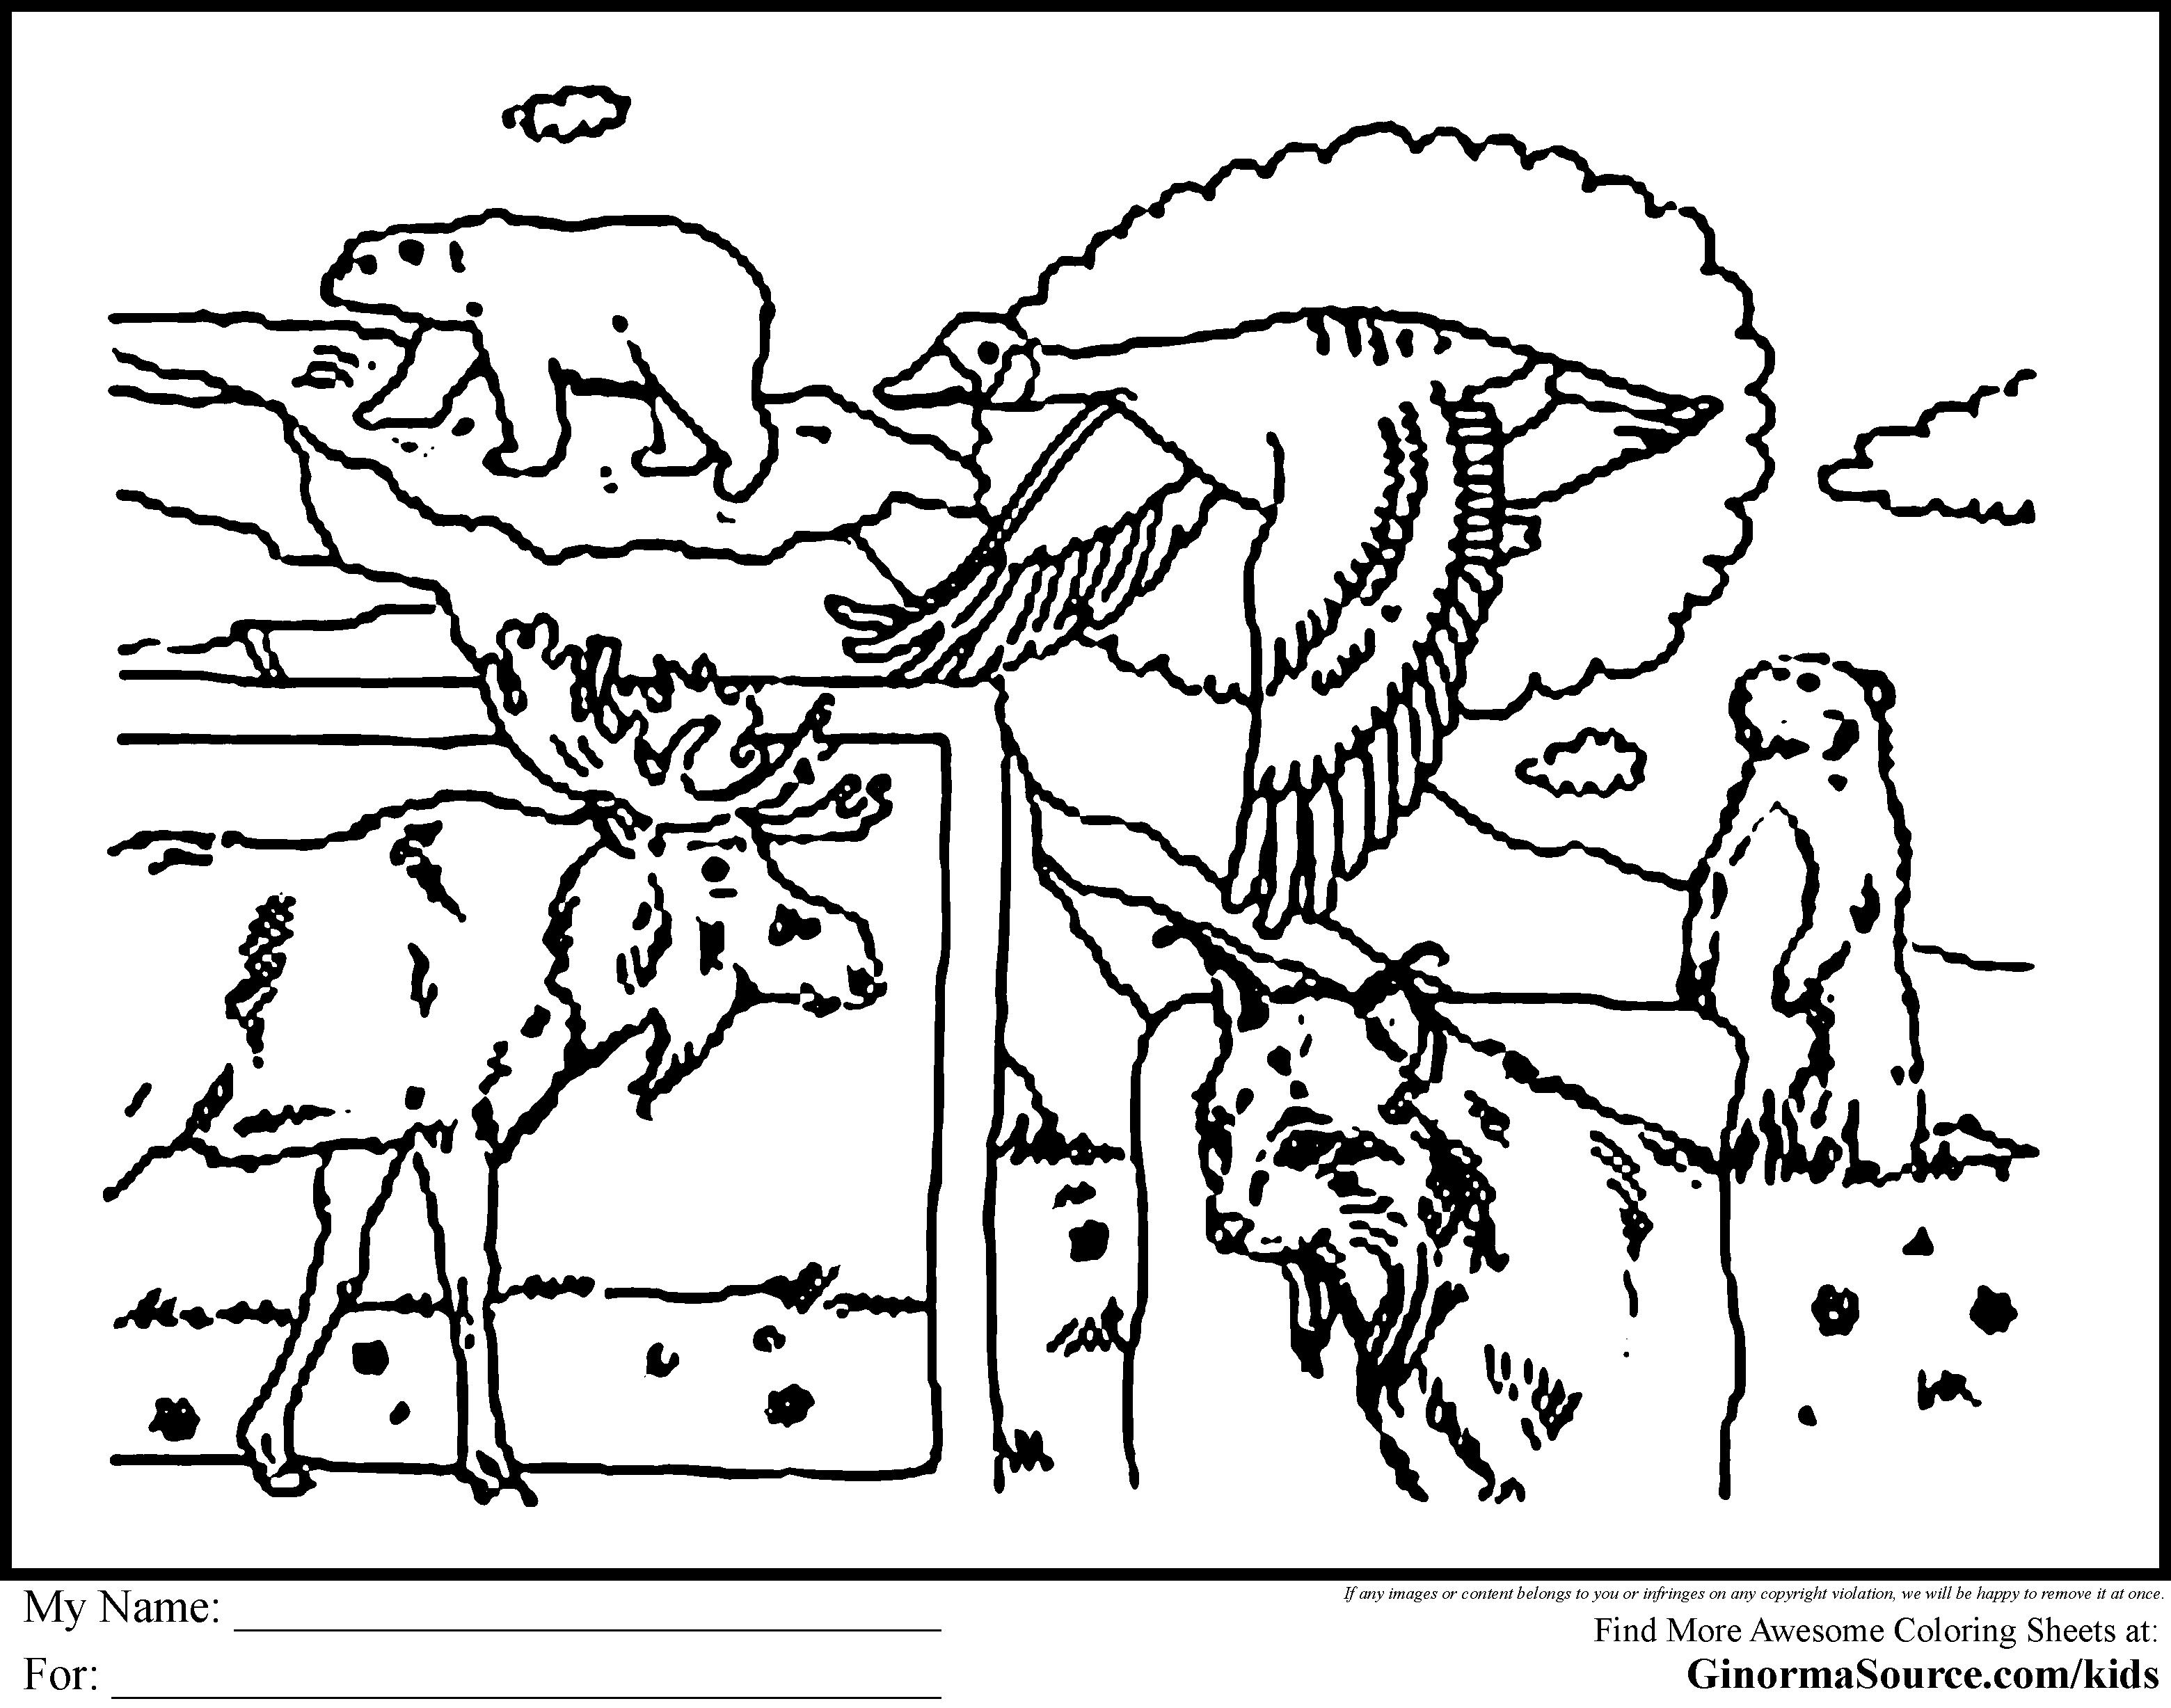 Canada coloring #2, Download drawings